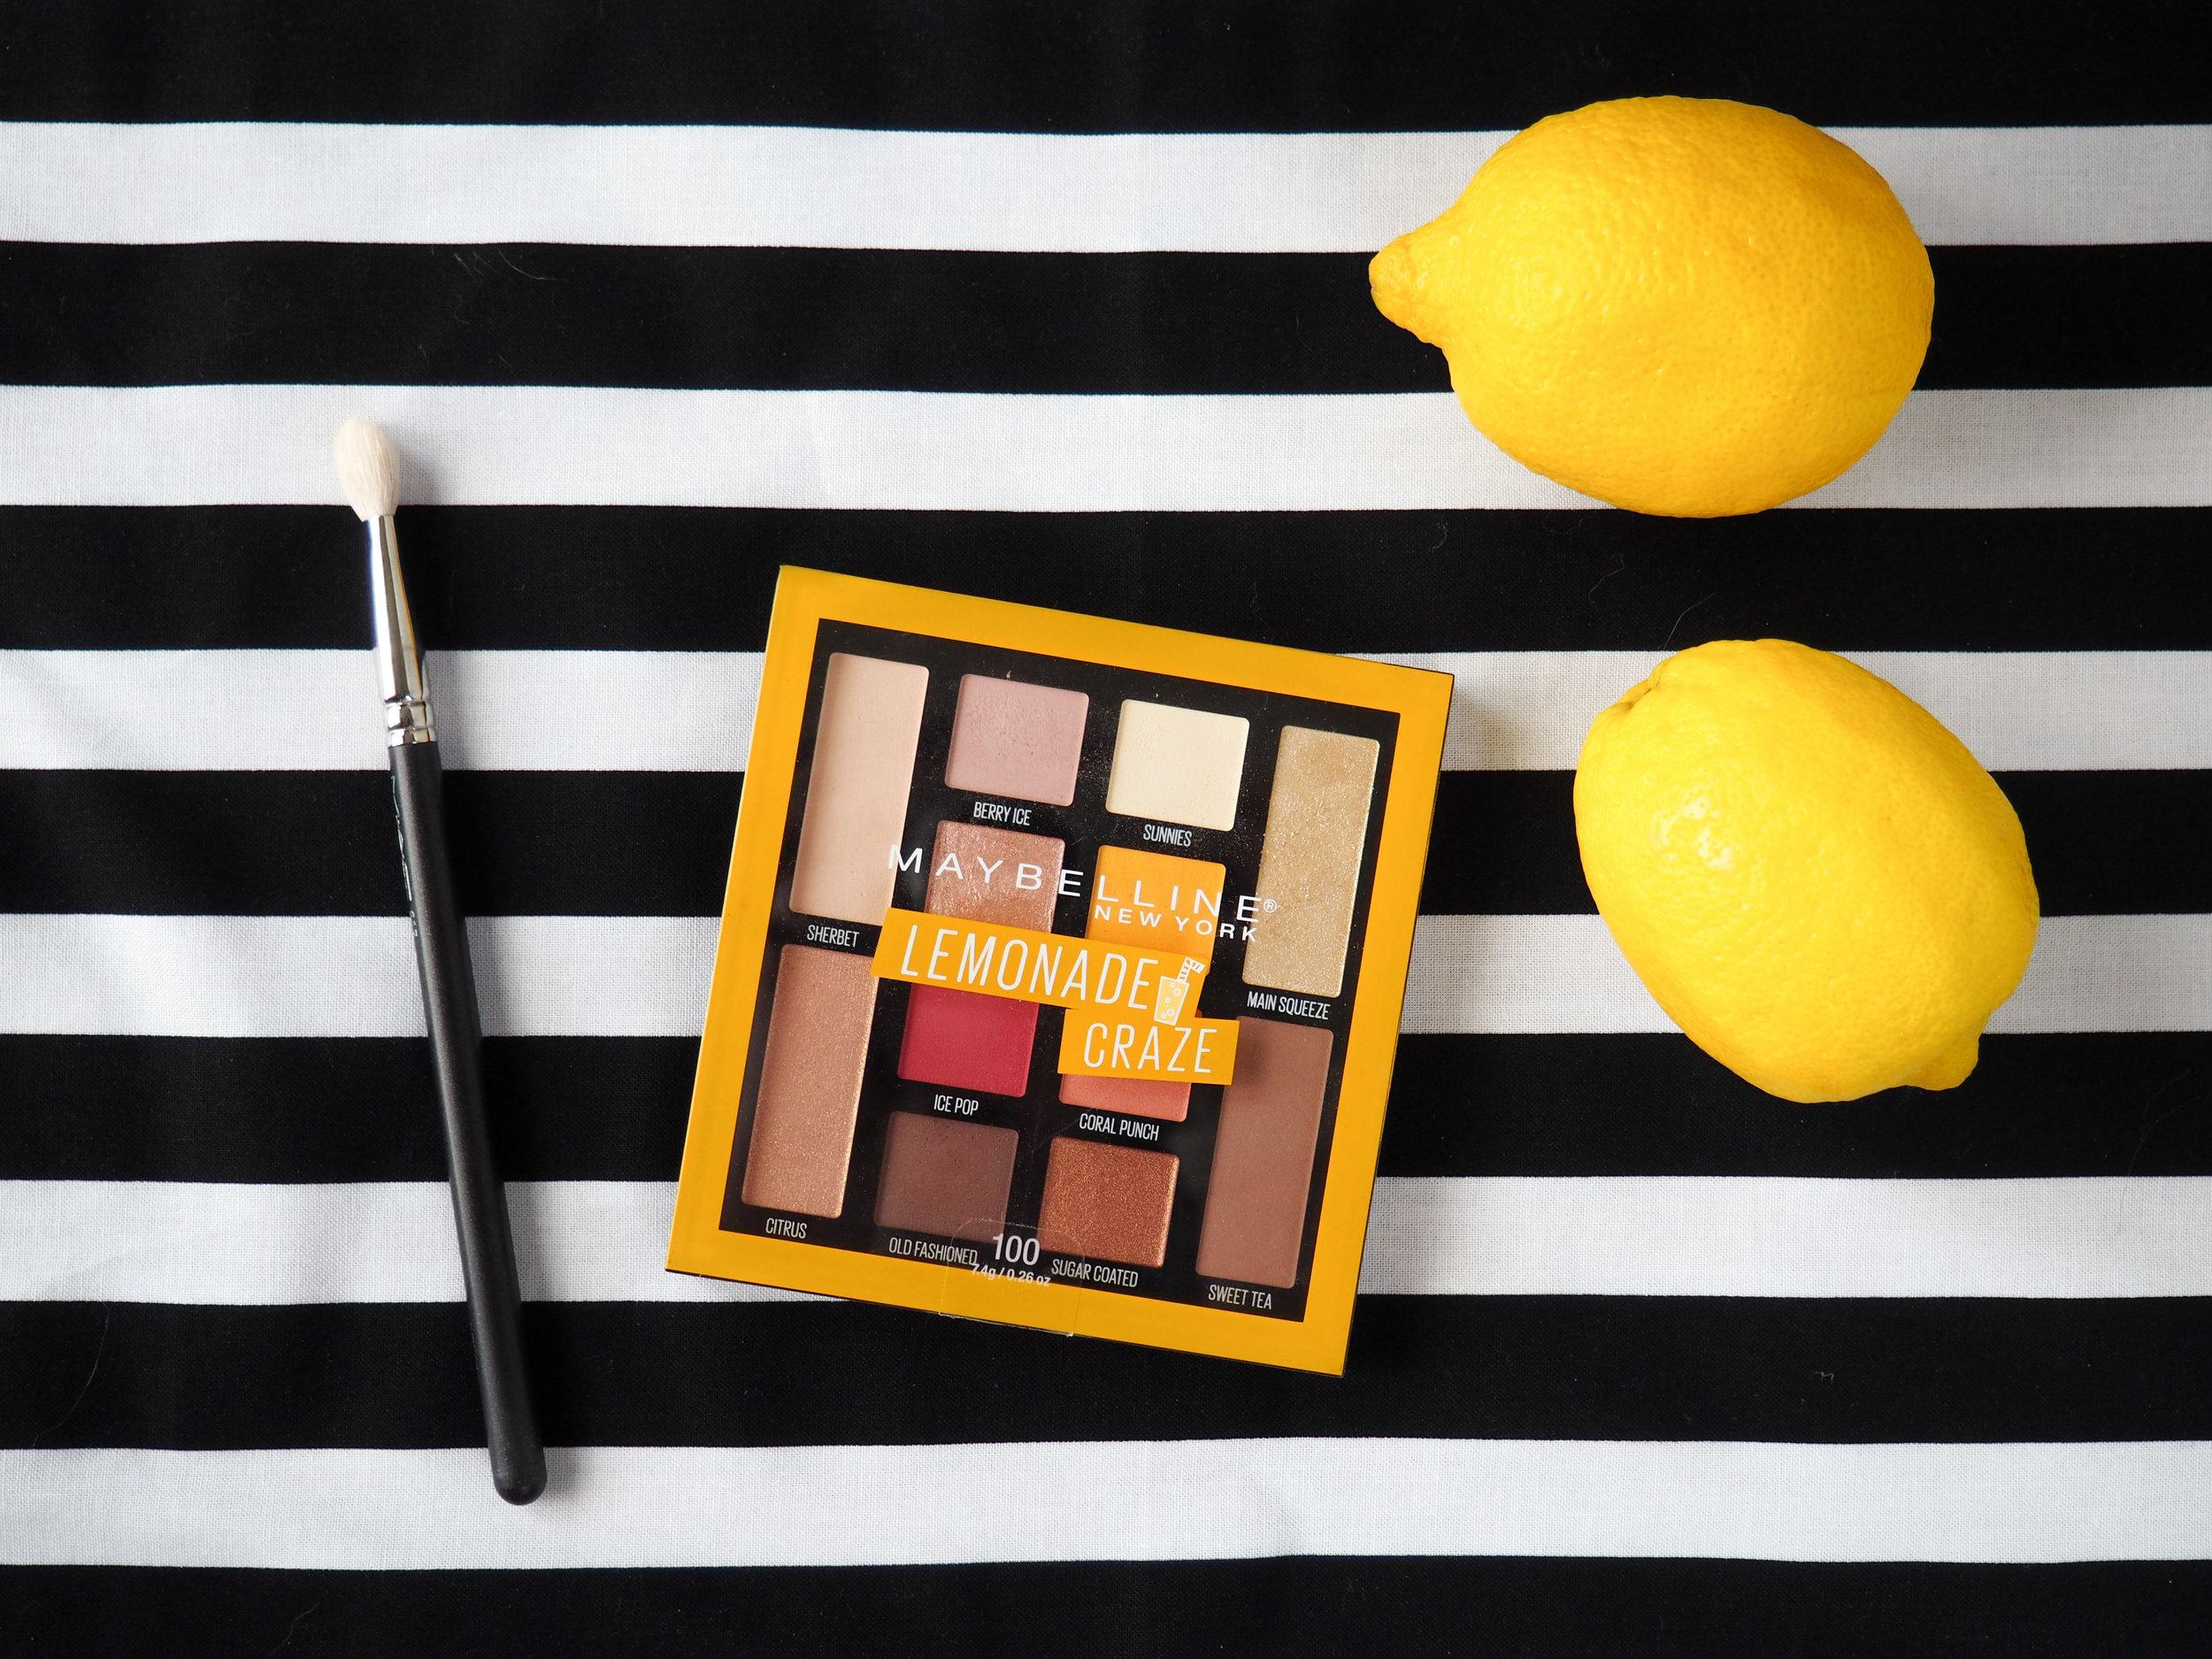 maybelline-lemonade-craze-palette-review-6.jpg